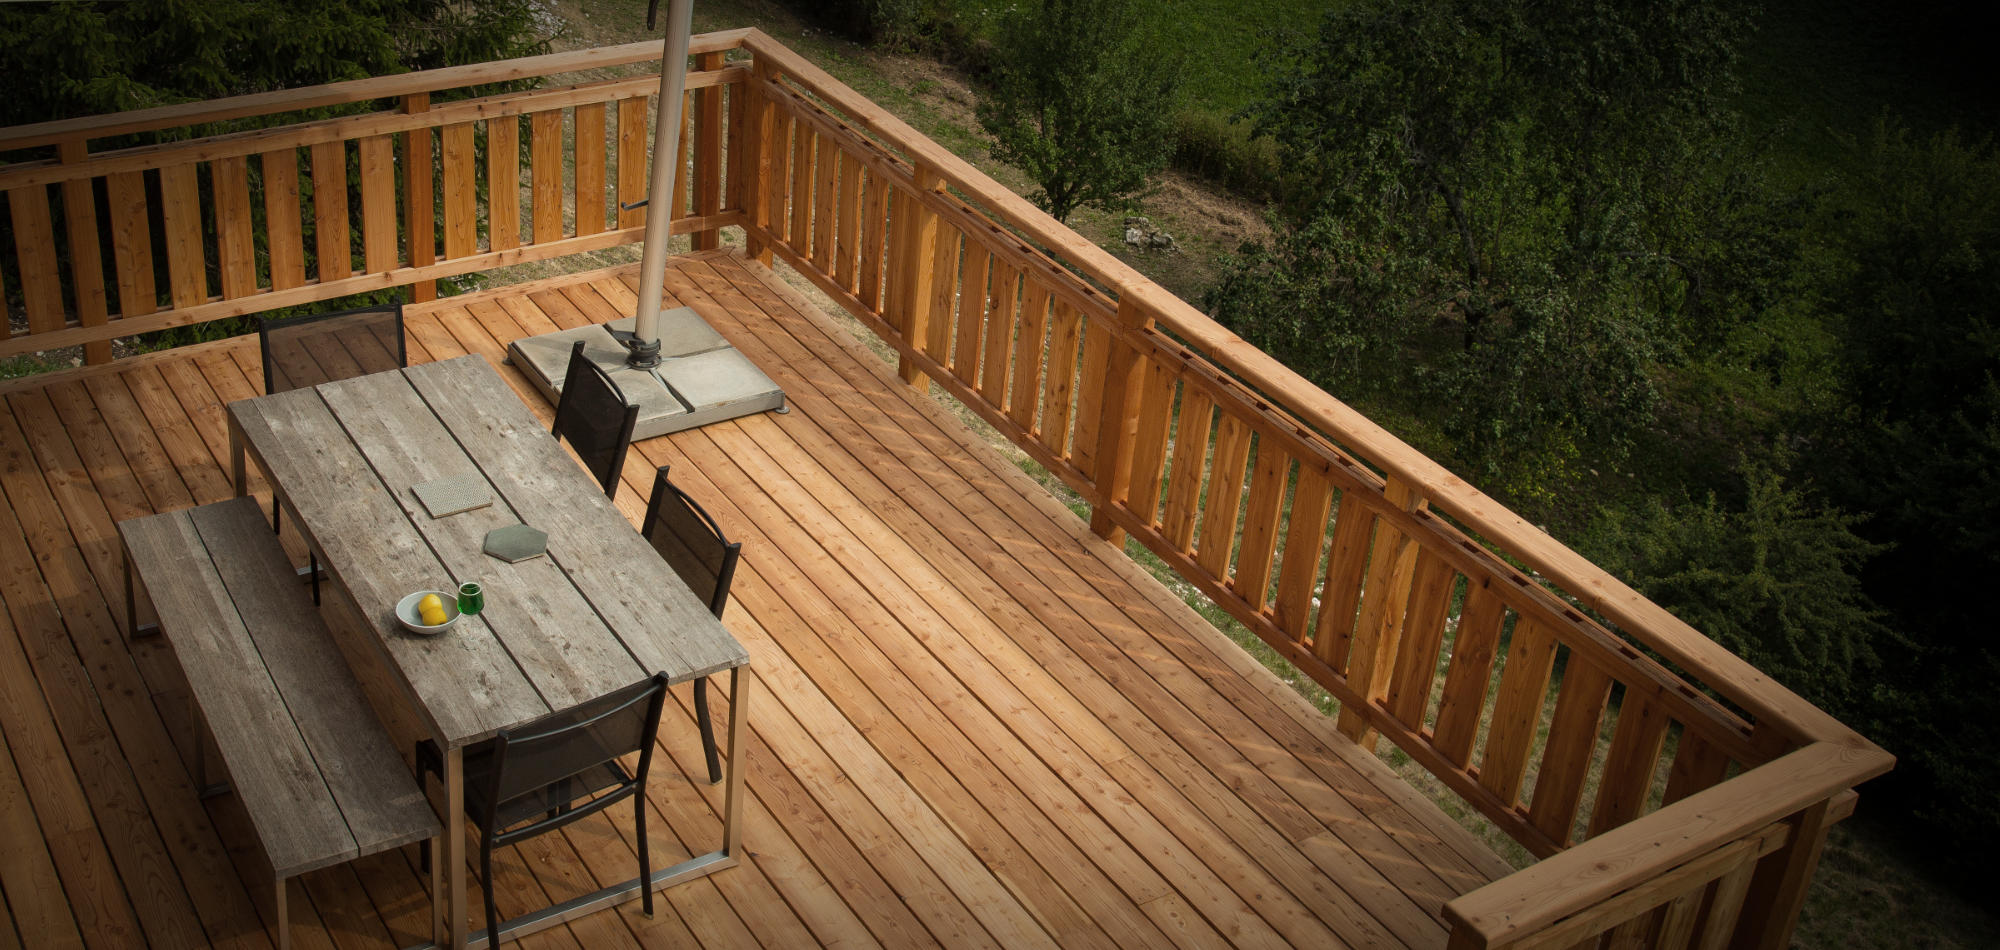 Construire Une Terrasse En Bois Surelevee construire une terrasse en bois sur pilotis